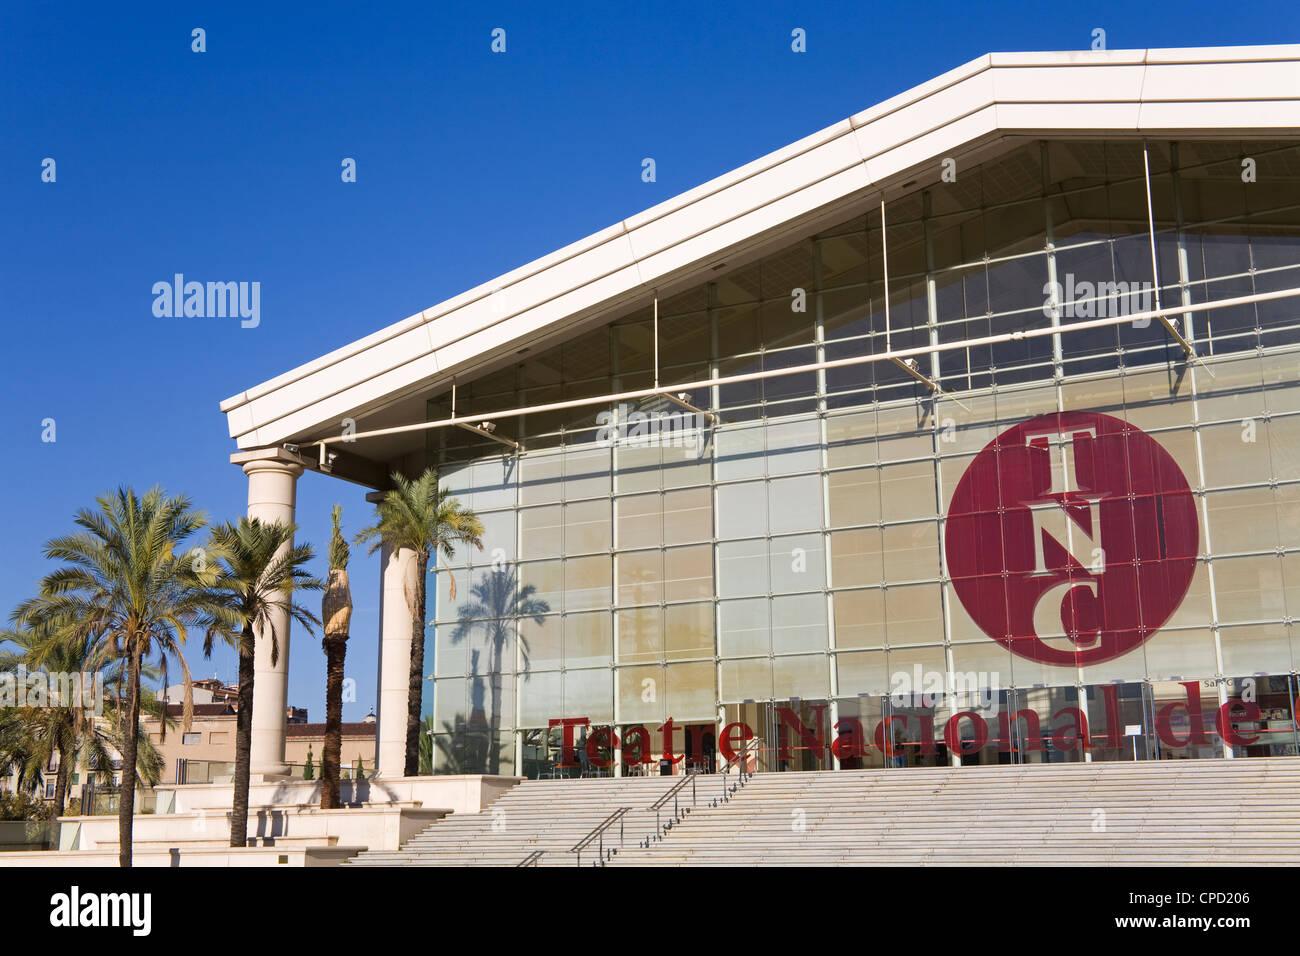 Teatre Nacional de Catalunya designed by Richard Bofill, Barcelona, Catalonia, Spain, Europe - Stock Image